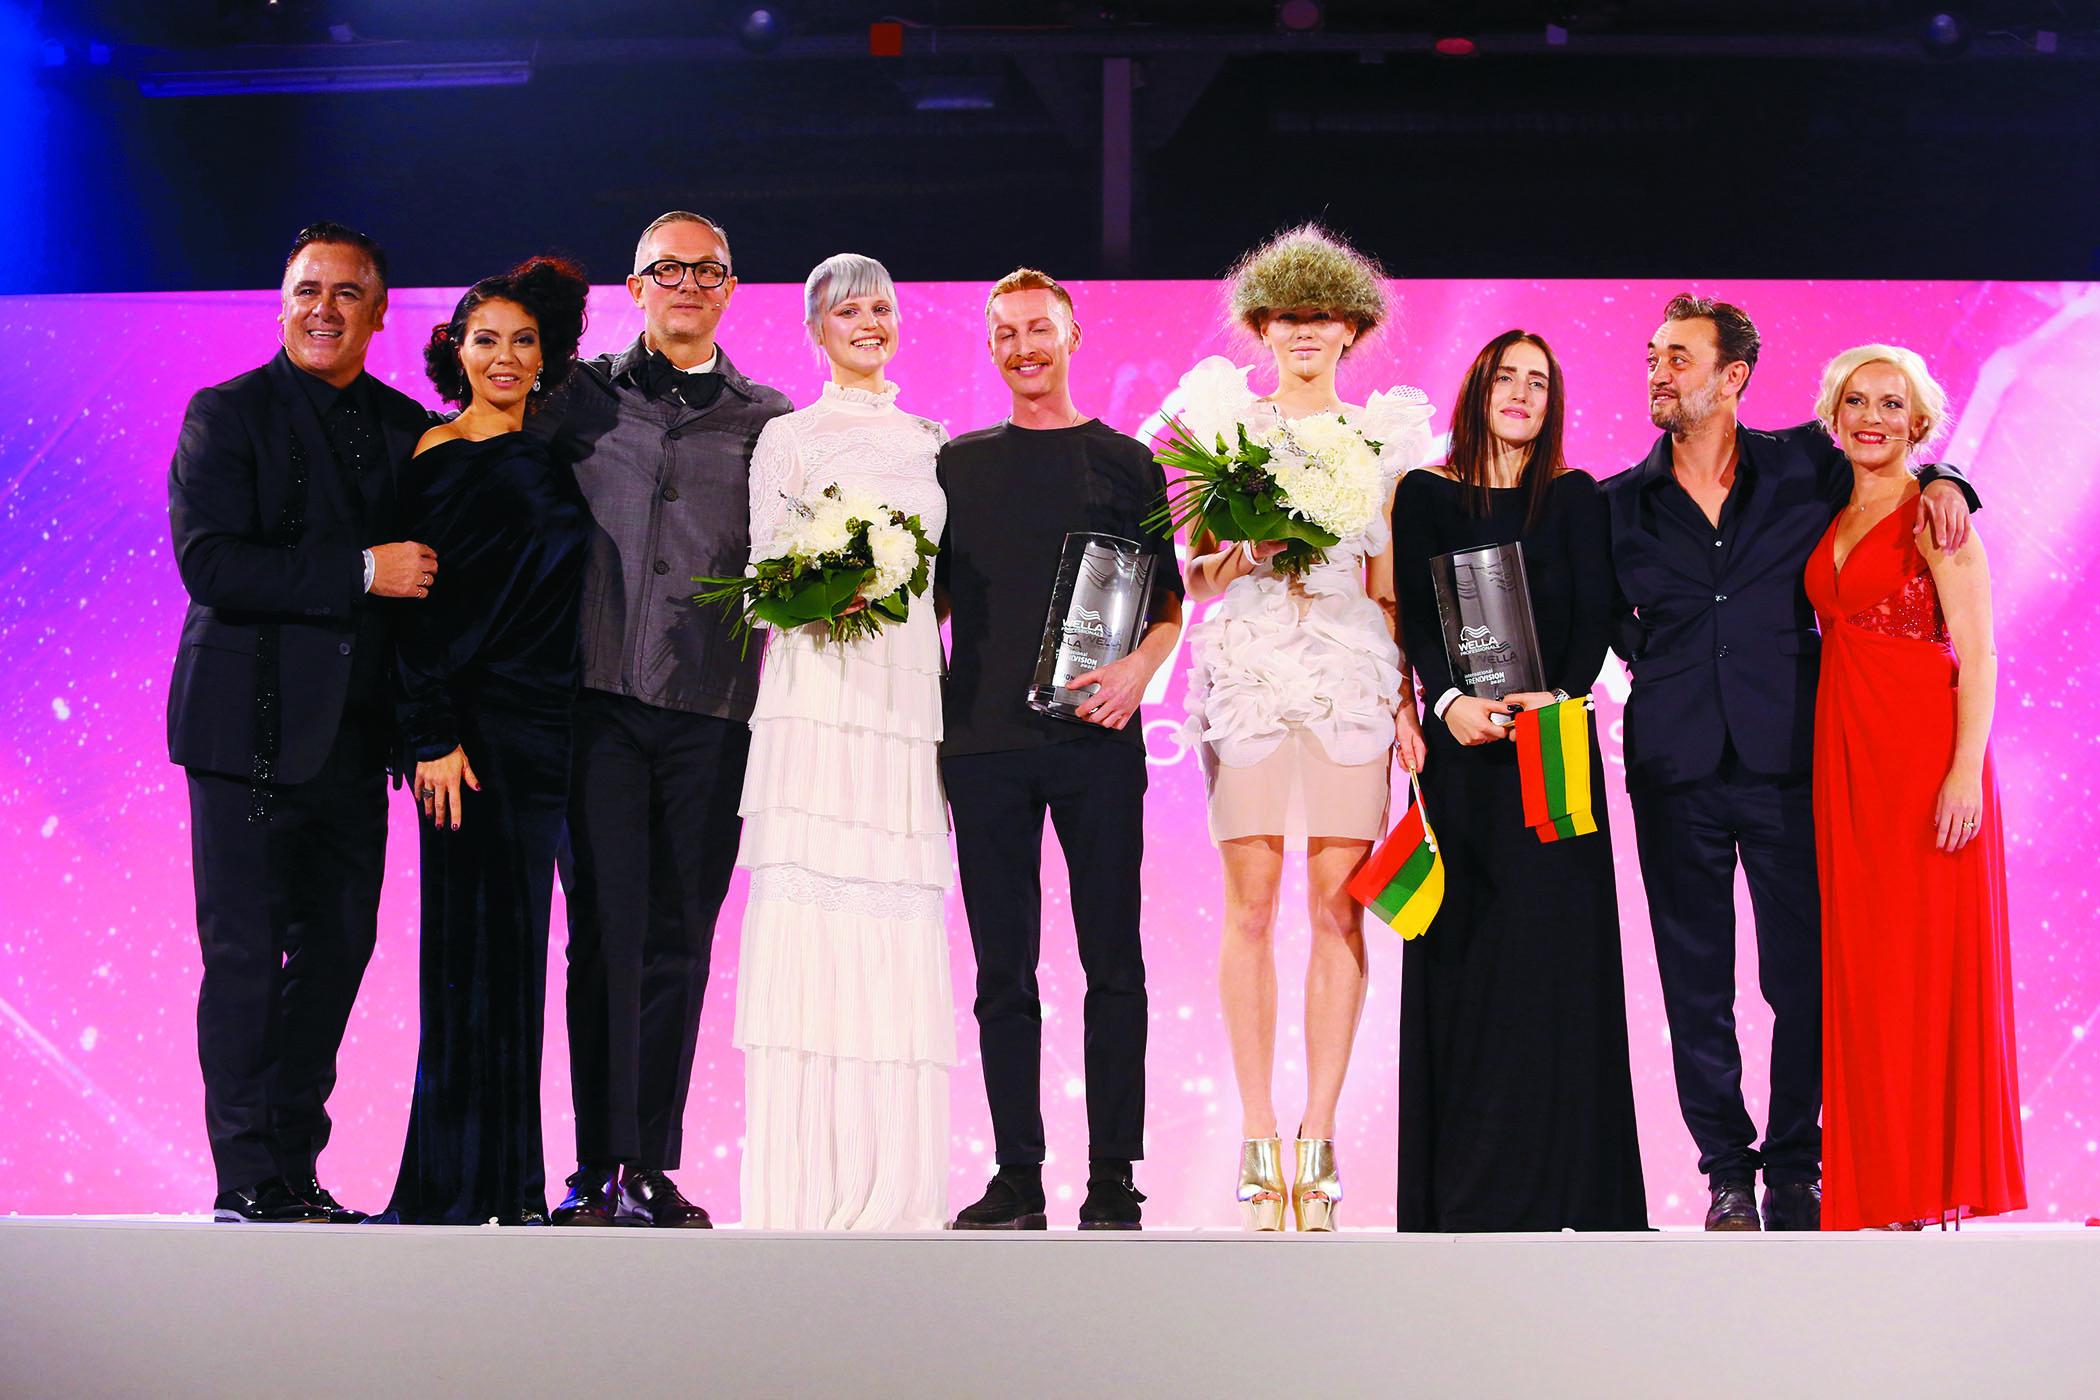 Eugene Souleiman joins Platinum winners Craig Clark and Anastasia Krupovich onstage.